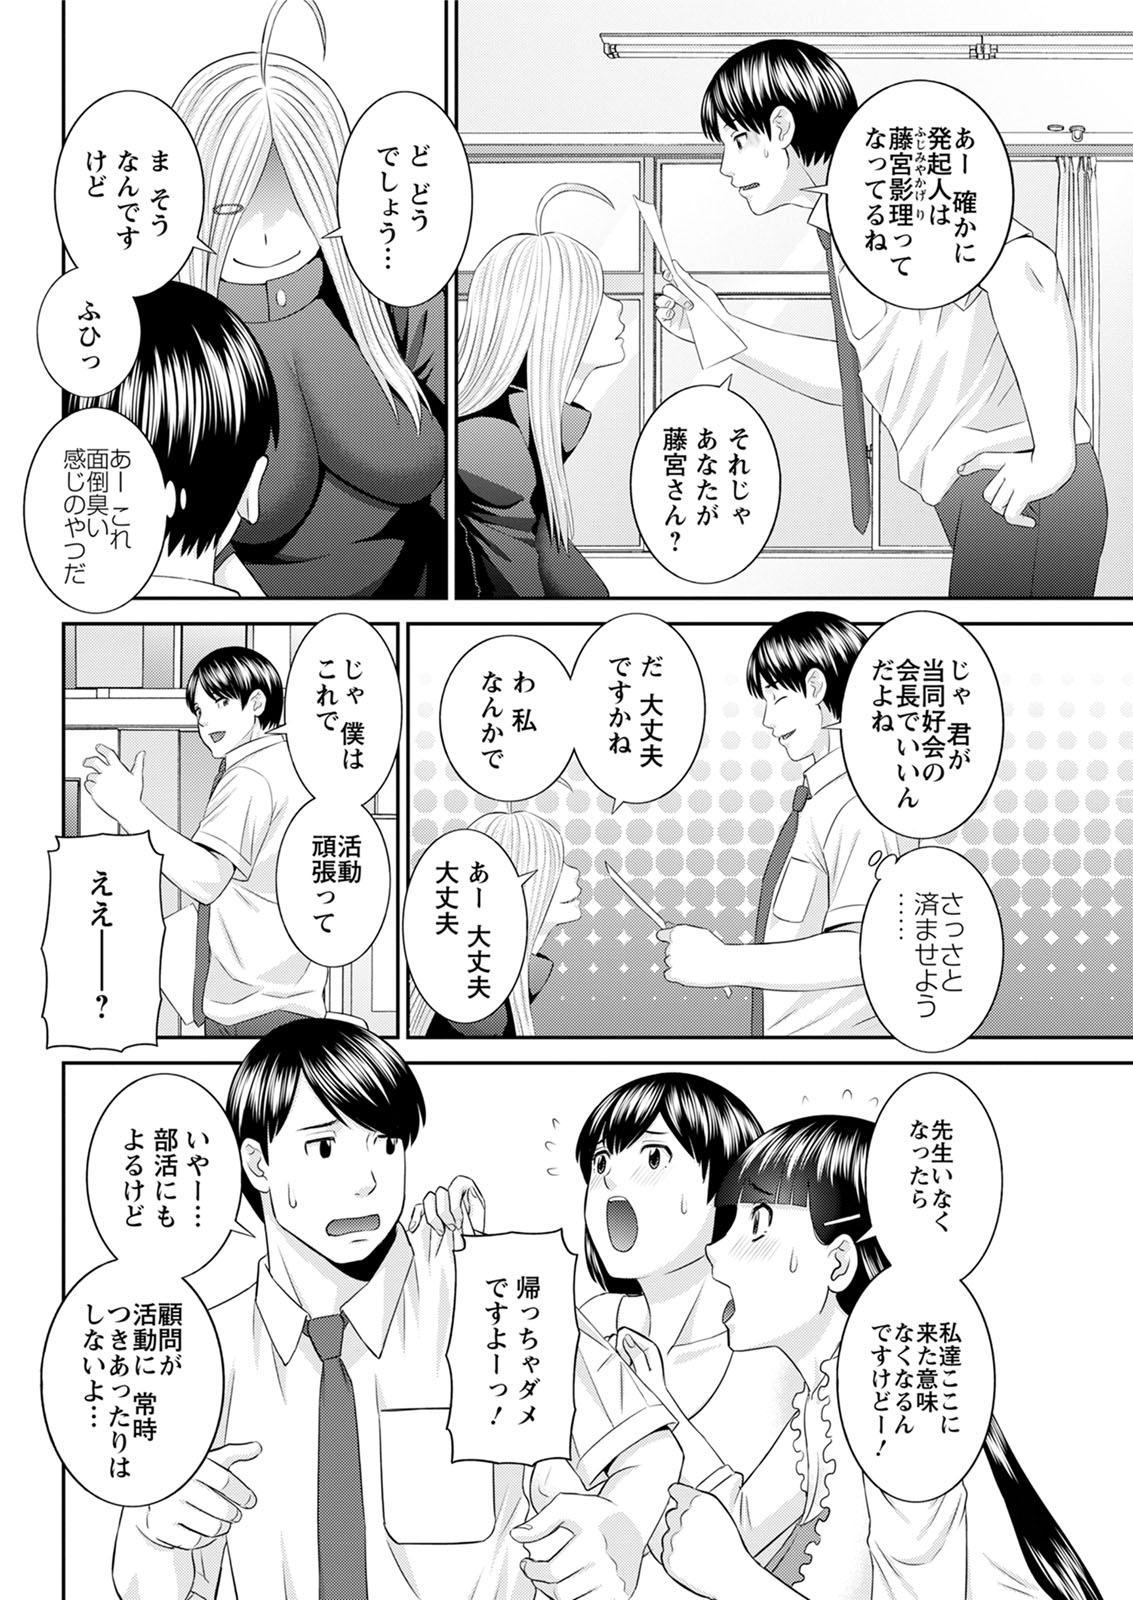 [Kawamori Misaki] Kaikan Hitotsuma Gakuen Ch. 1-6, 8-16 [Digital] 260